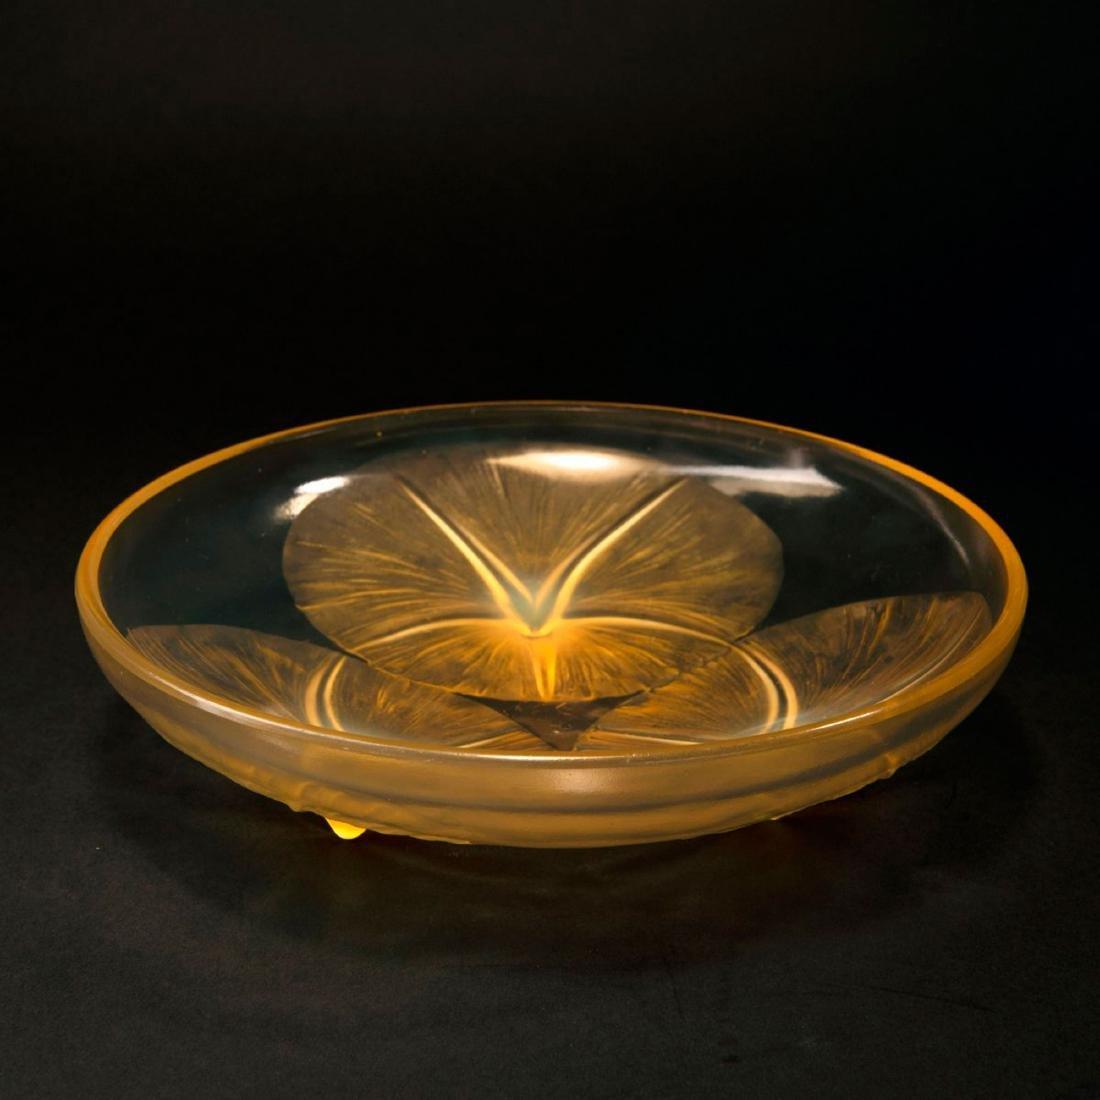 'Volubilis' bowl, 1921